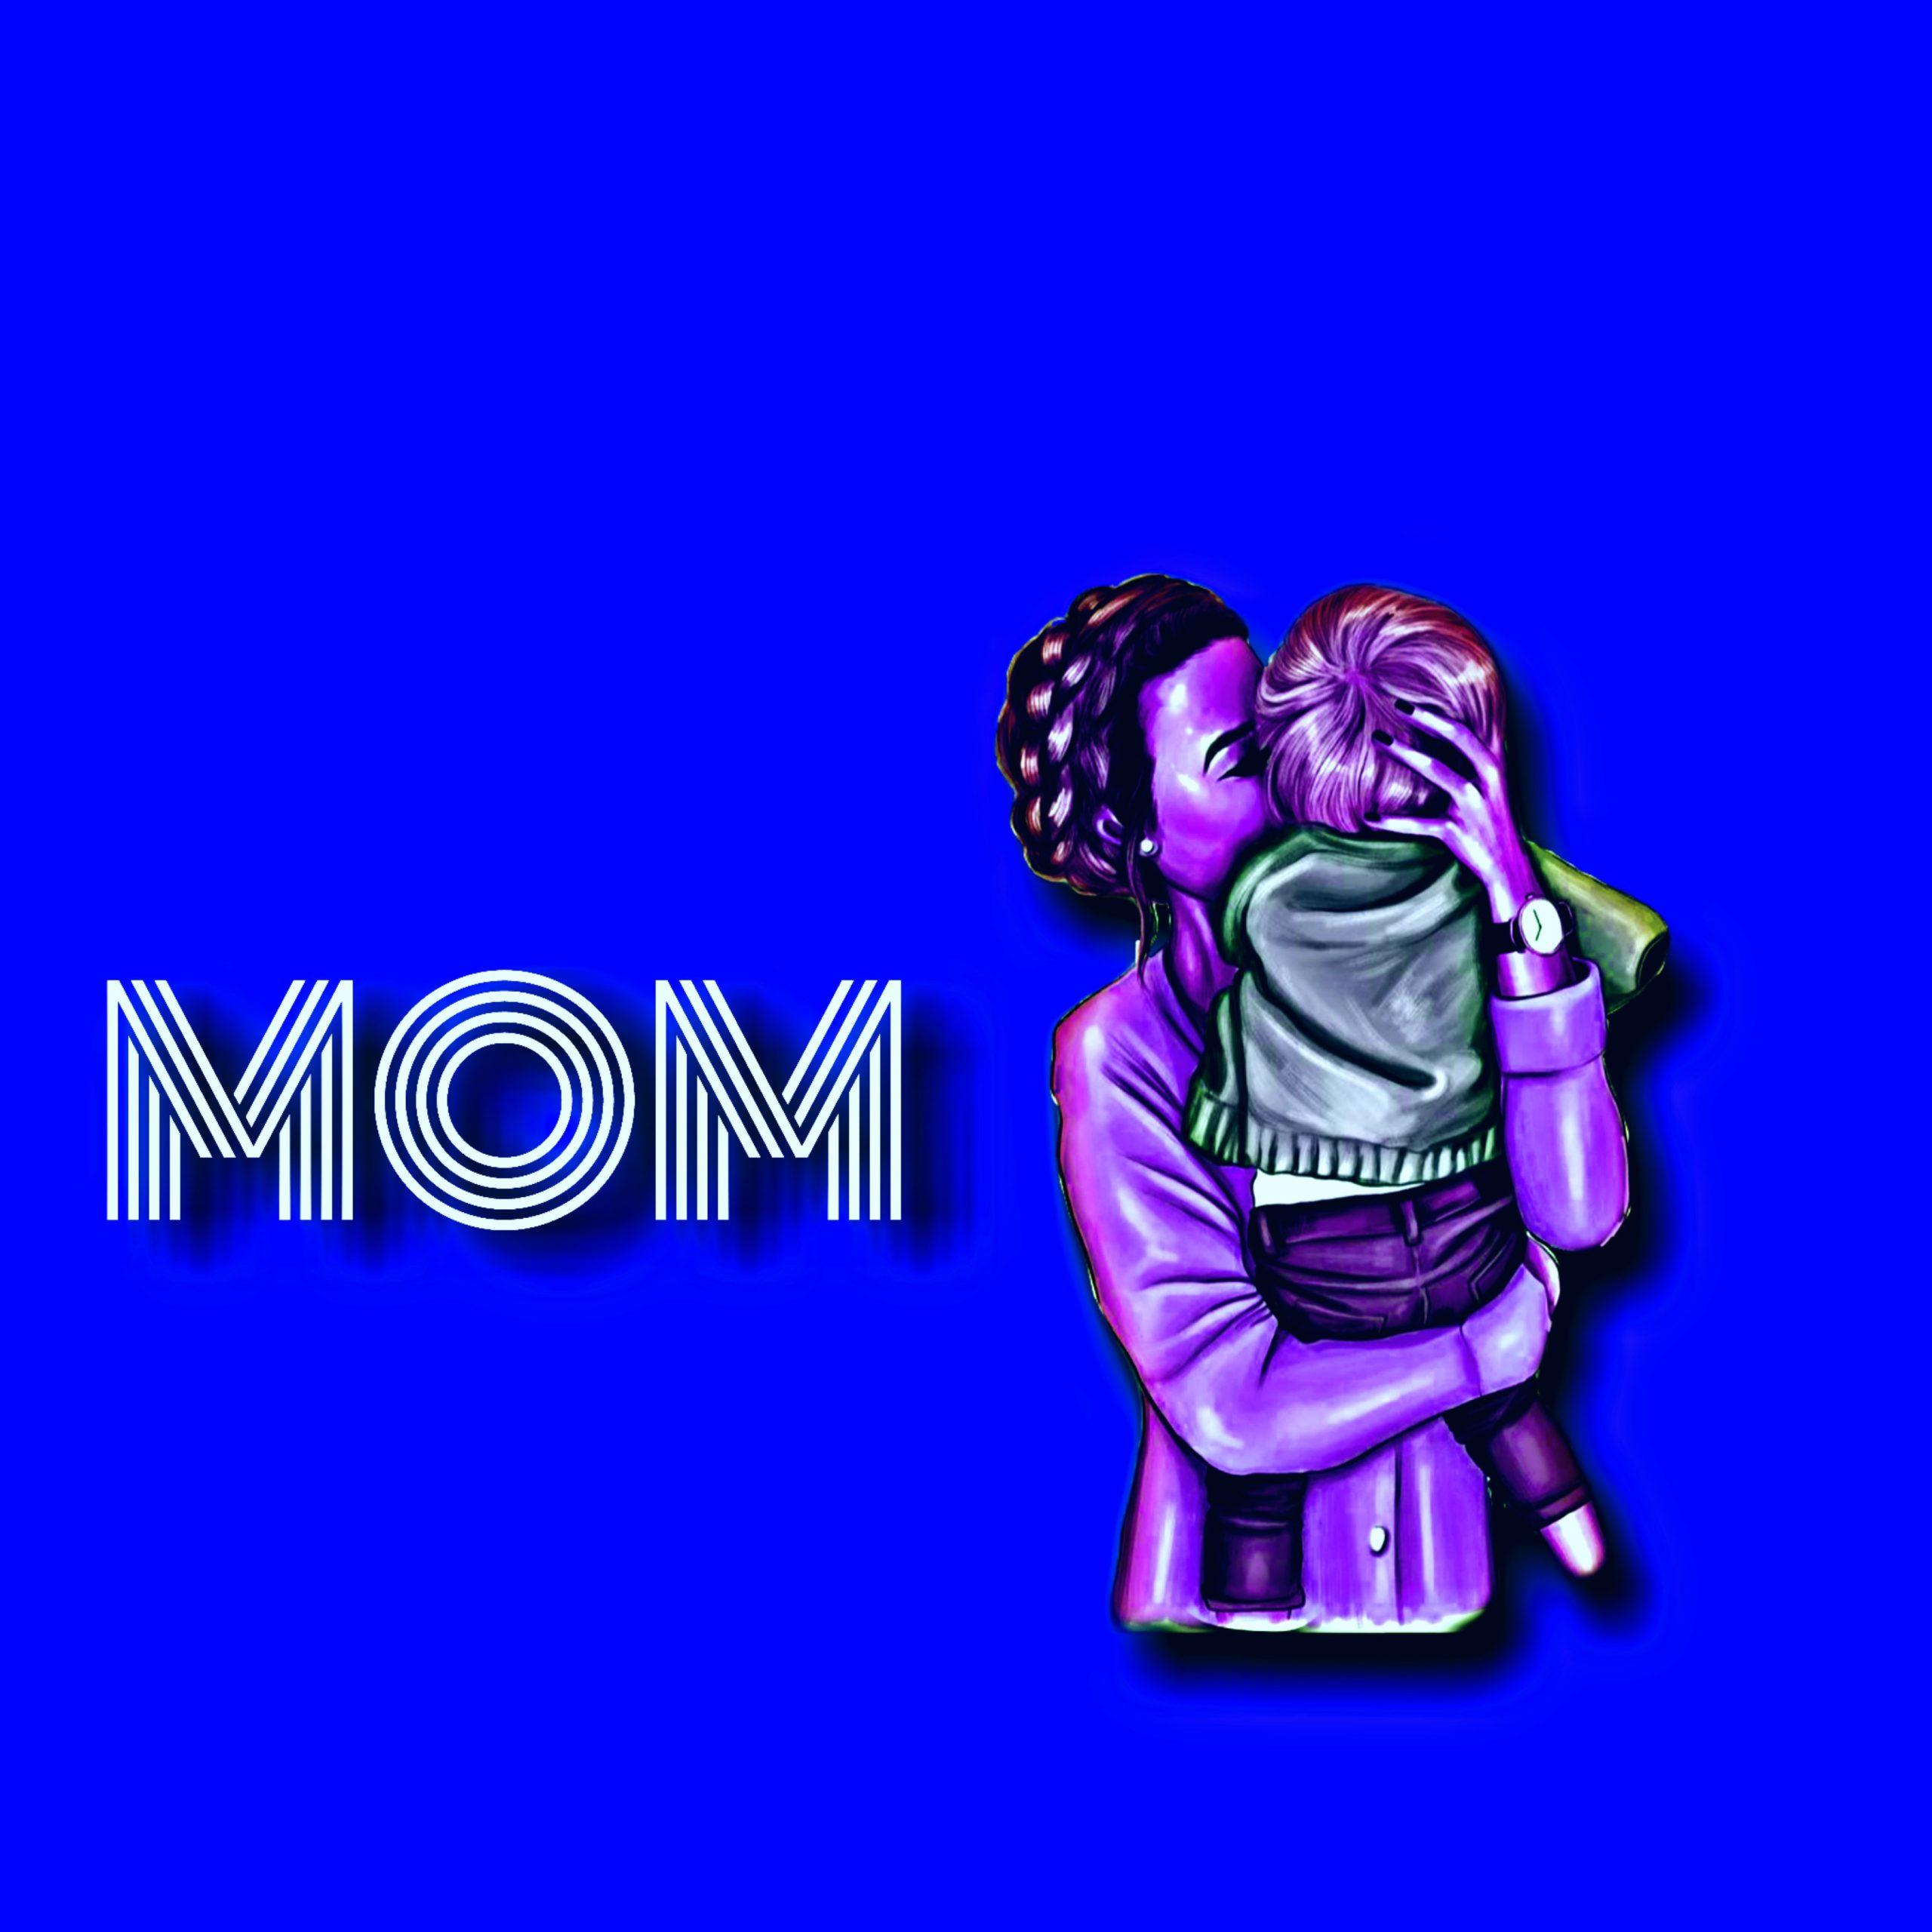 Mom and child illustration